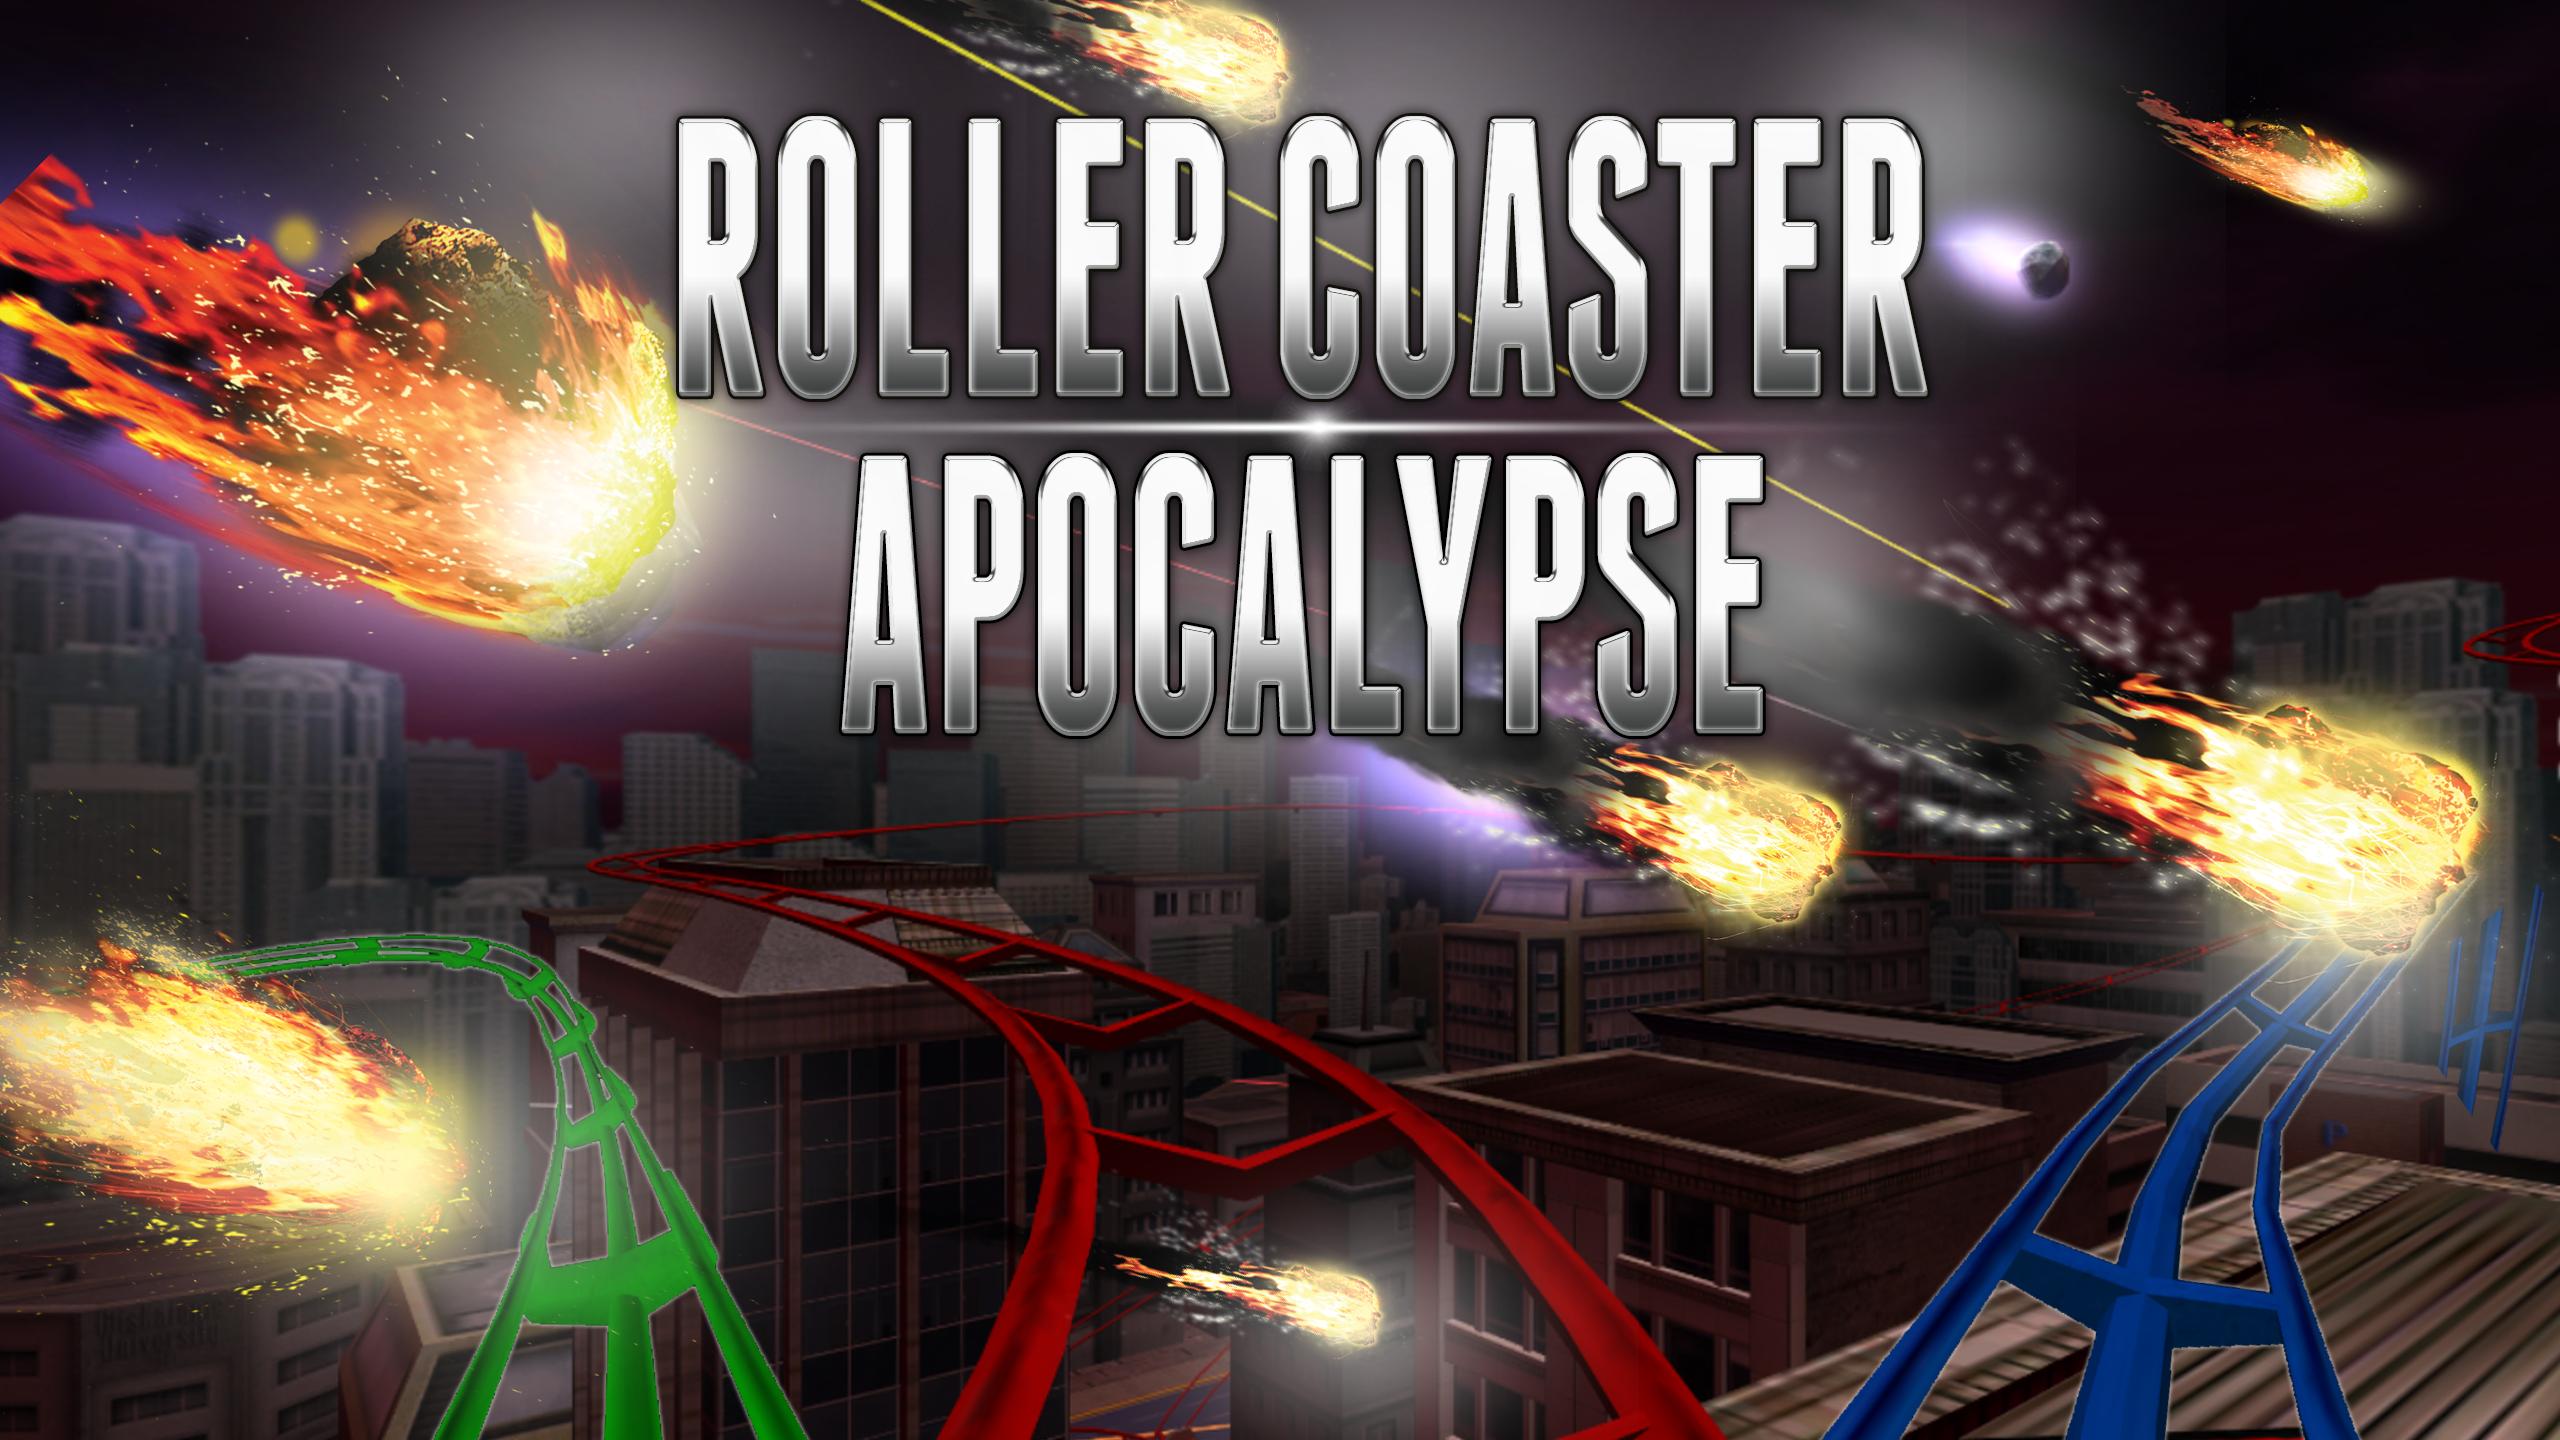 Roller Coaster Apocalypse